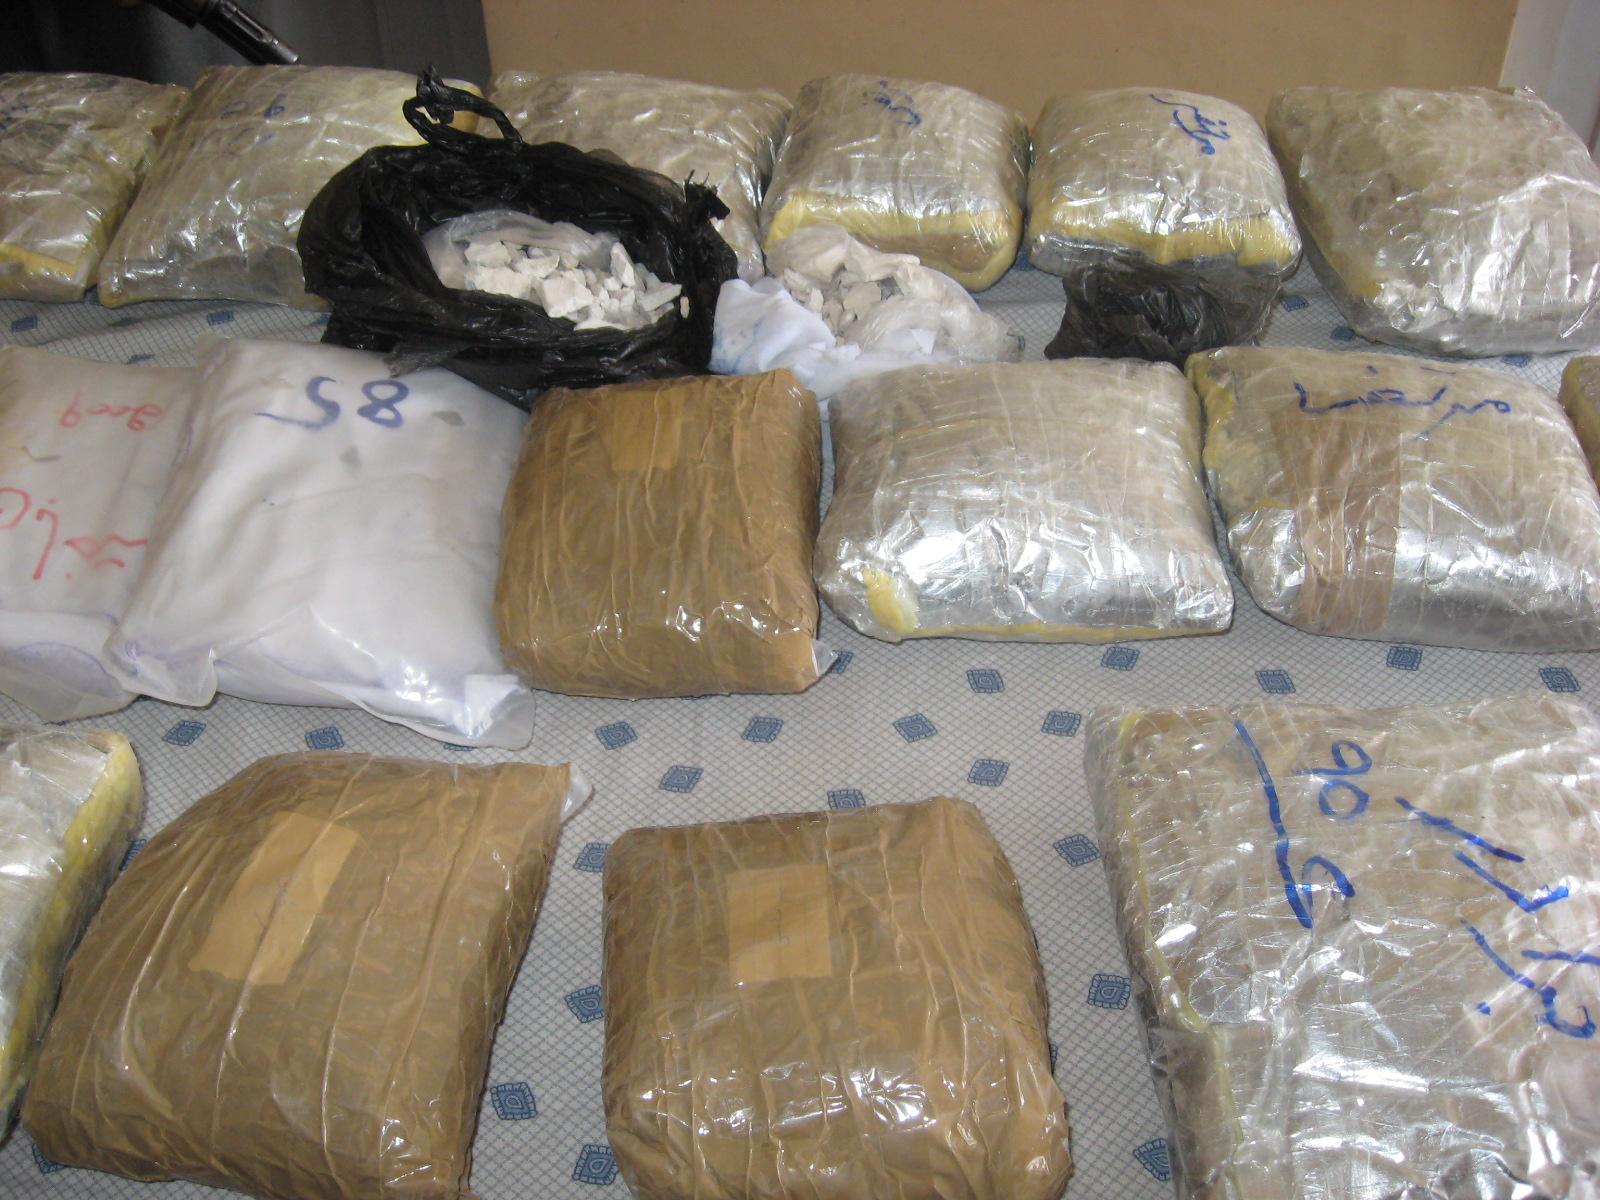 کشف 8 تن مواد مخدر در گذرگاه سرحدی چمن